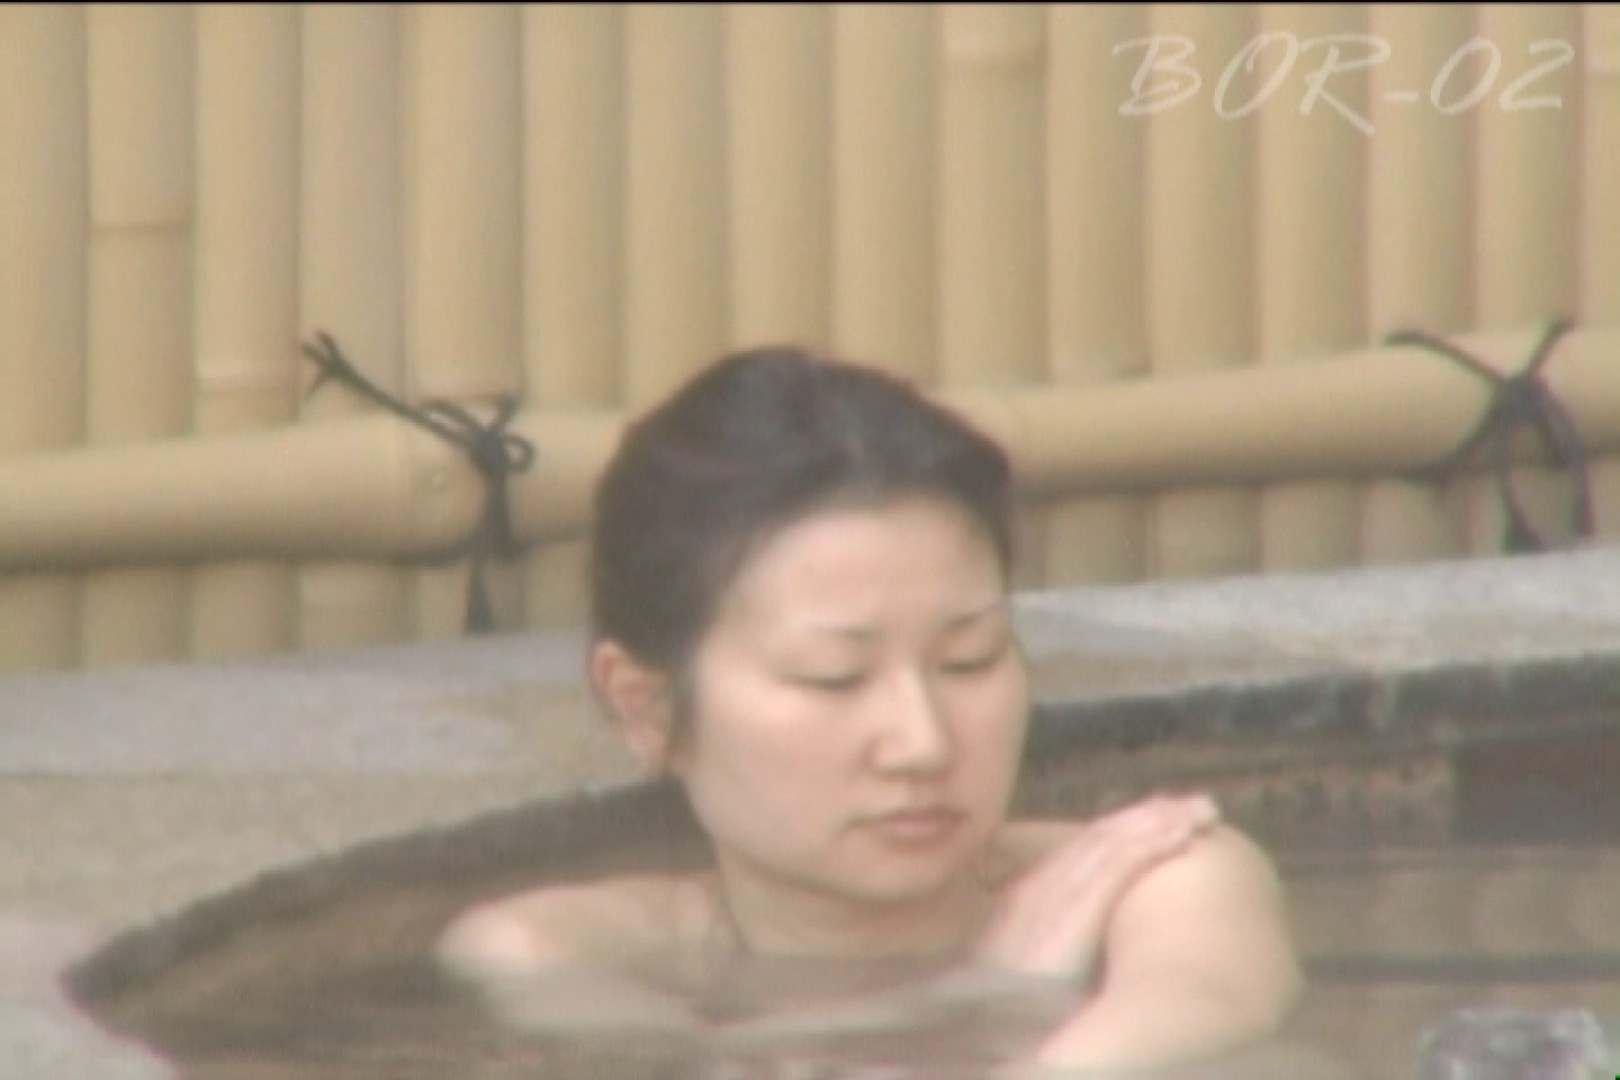 Aquaな露天風呂Vol.477 OLセックス 盗撮われめAV動画紹介 86画像 2